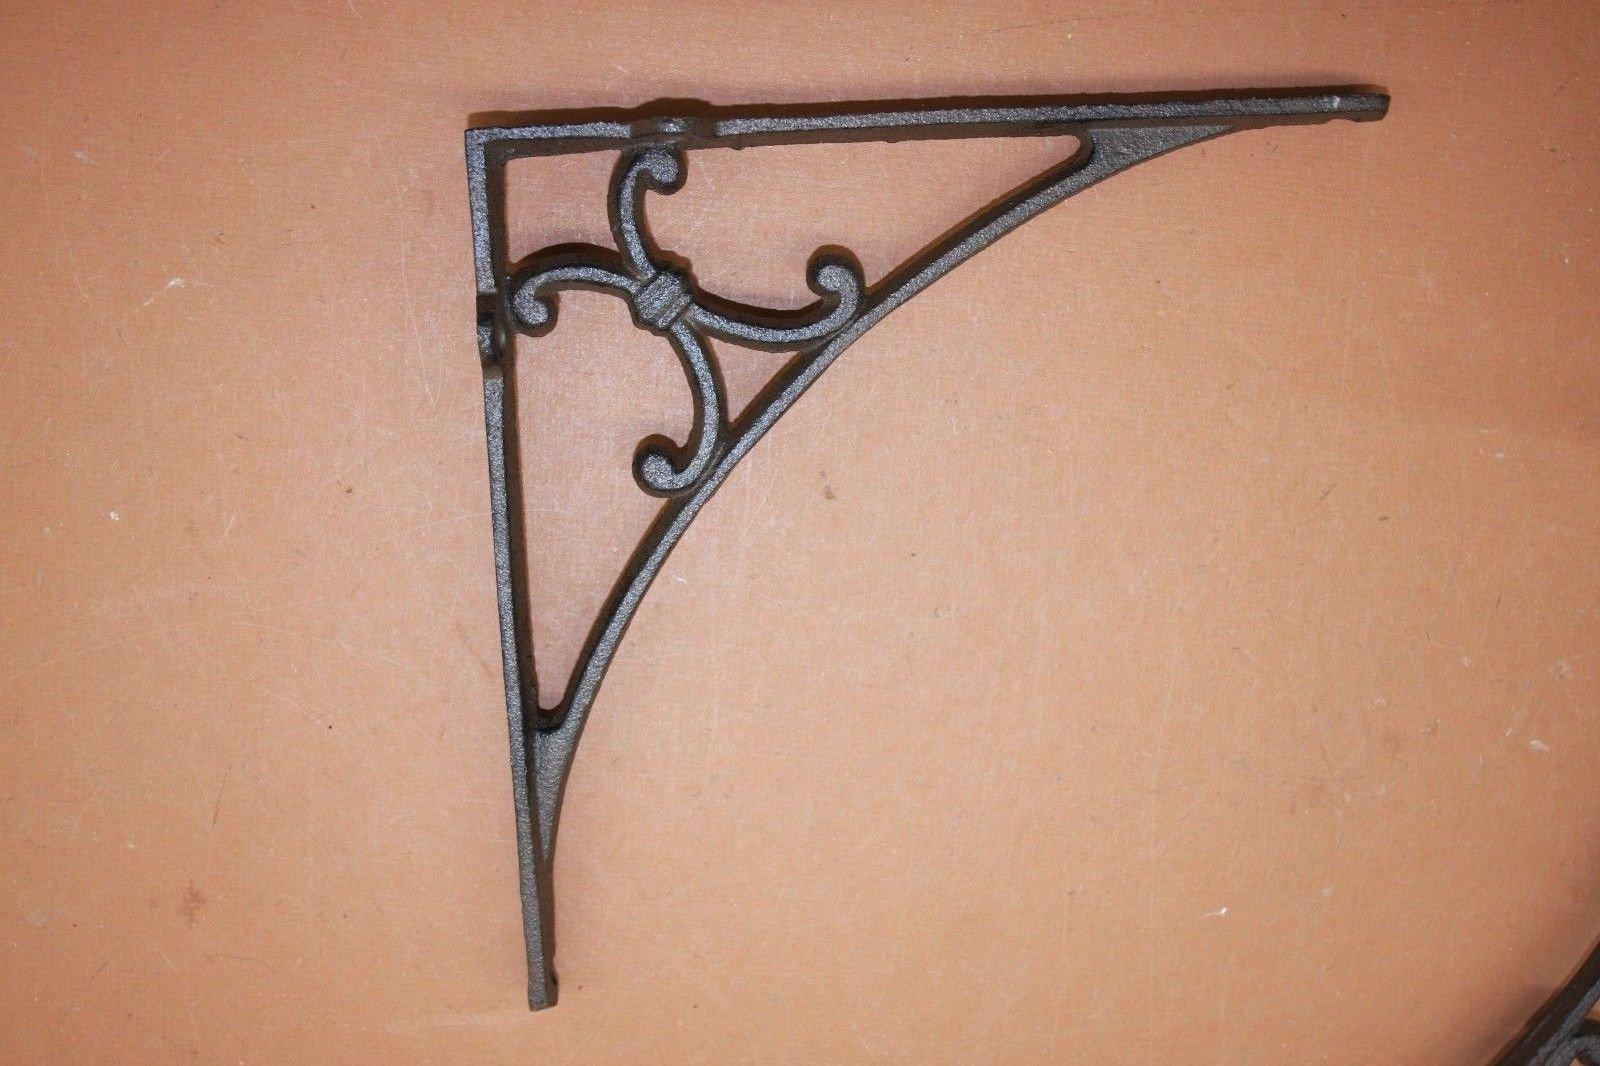 Mission Design Entry way Door Corner Decorative Brackets, Solid Cast Iron 9 3/8 inch, B-50, Set of 2